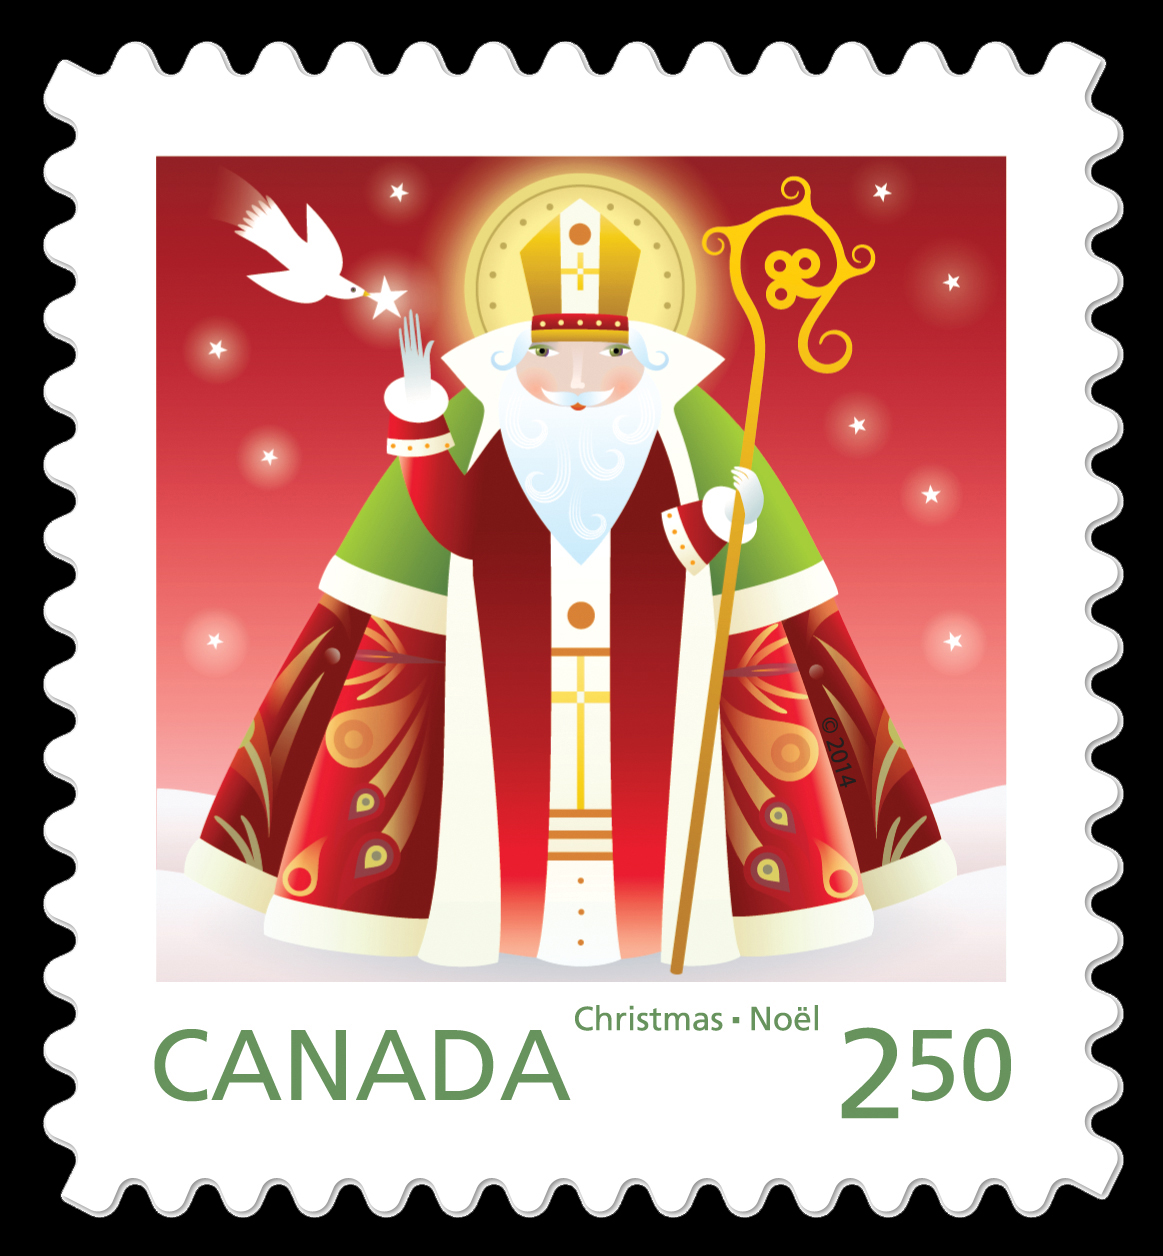 St. Nicolas Canada Postage Stamp | Santa 2014